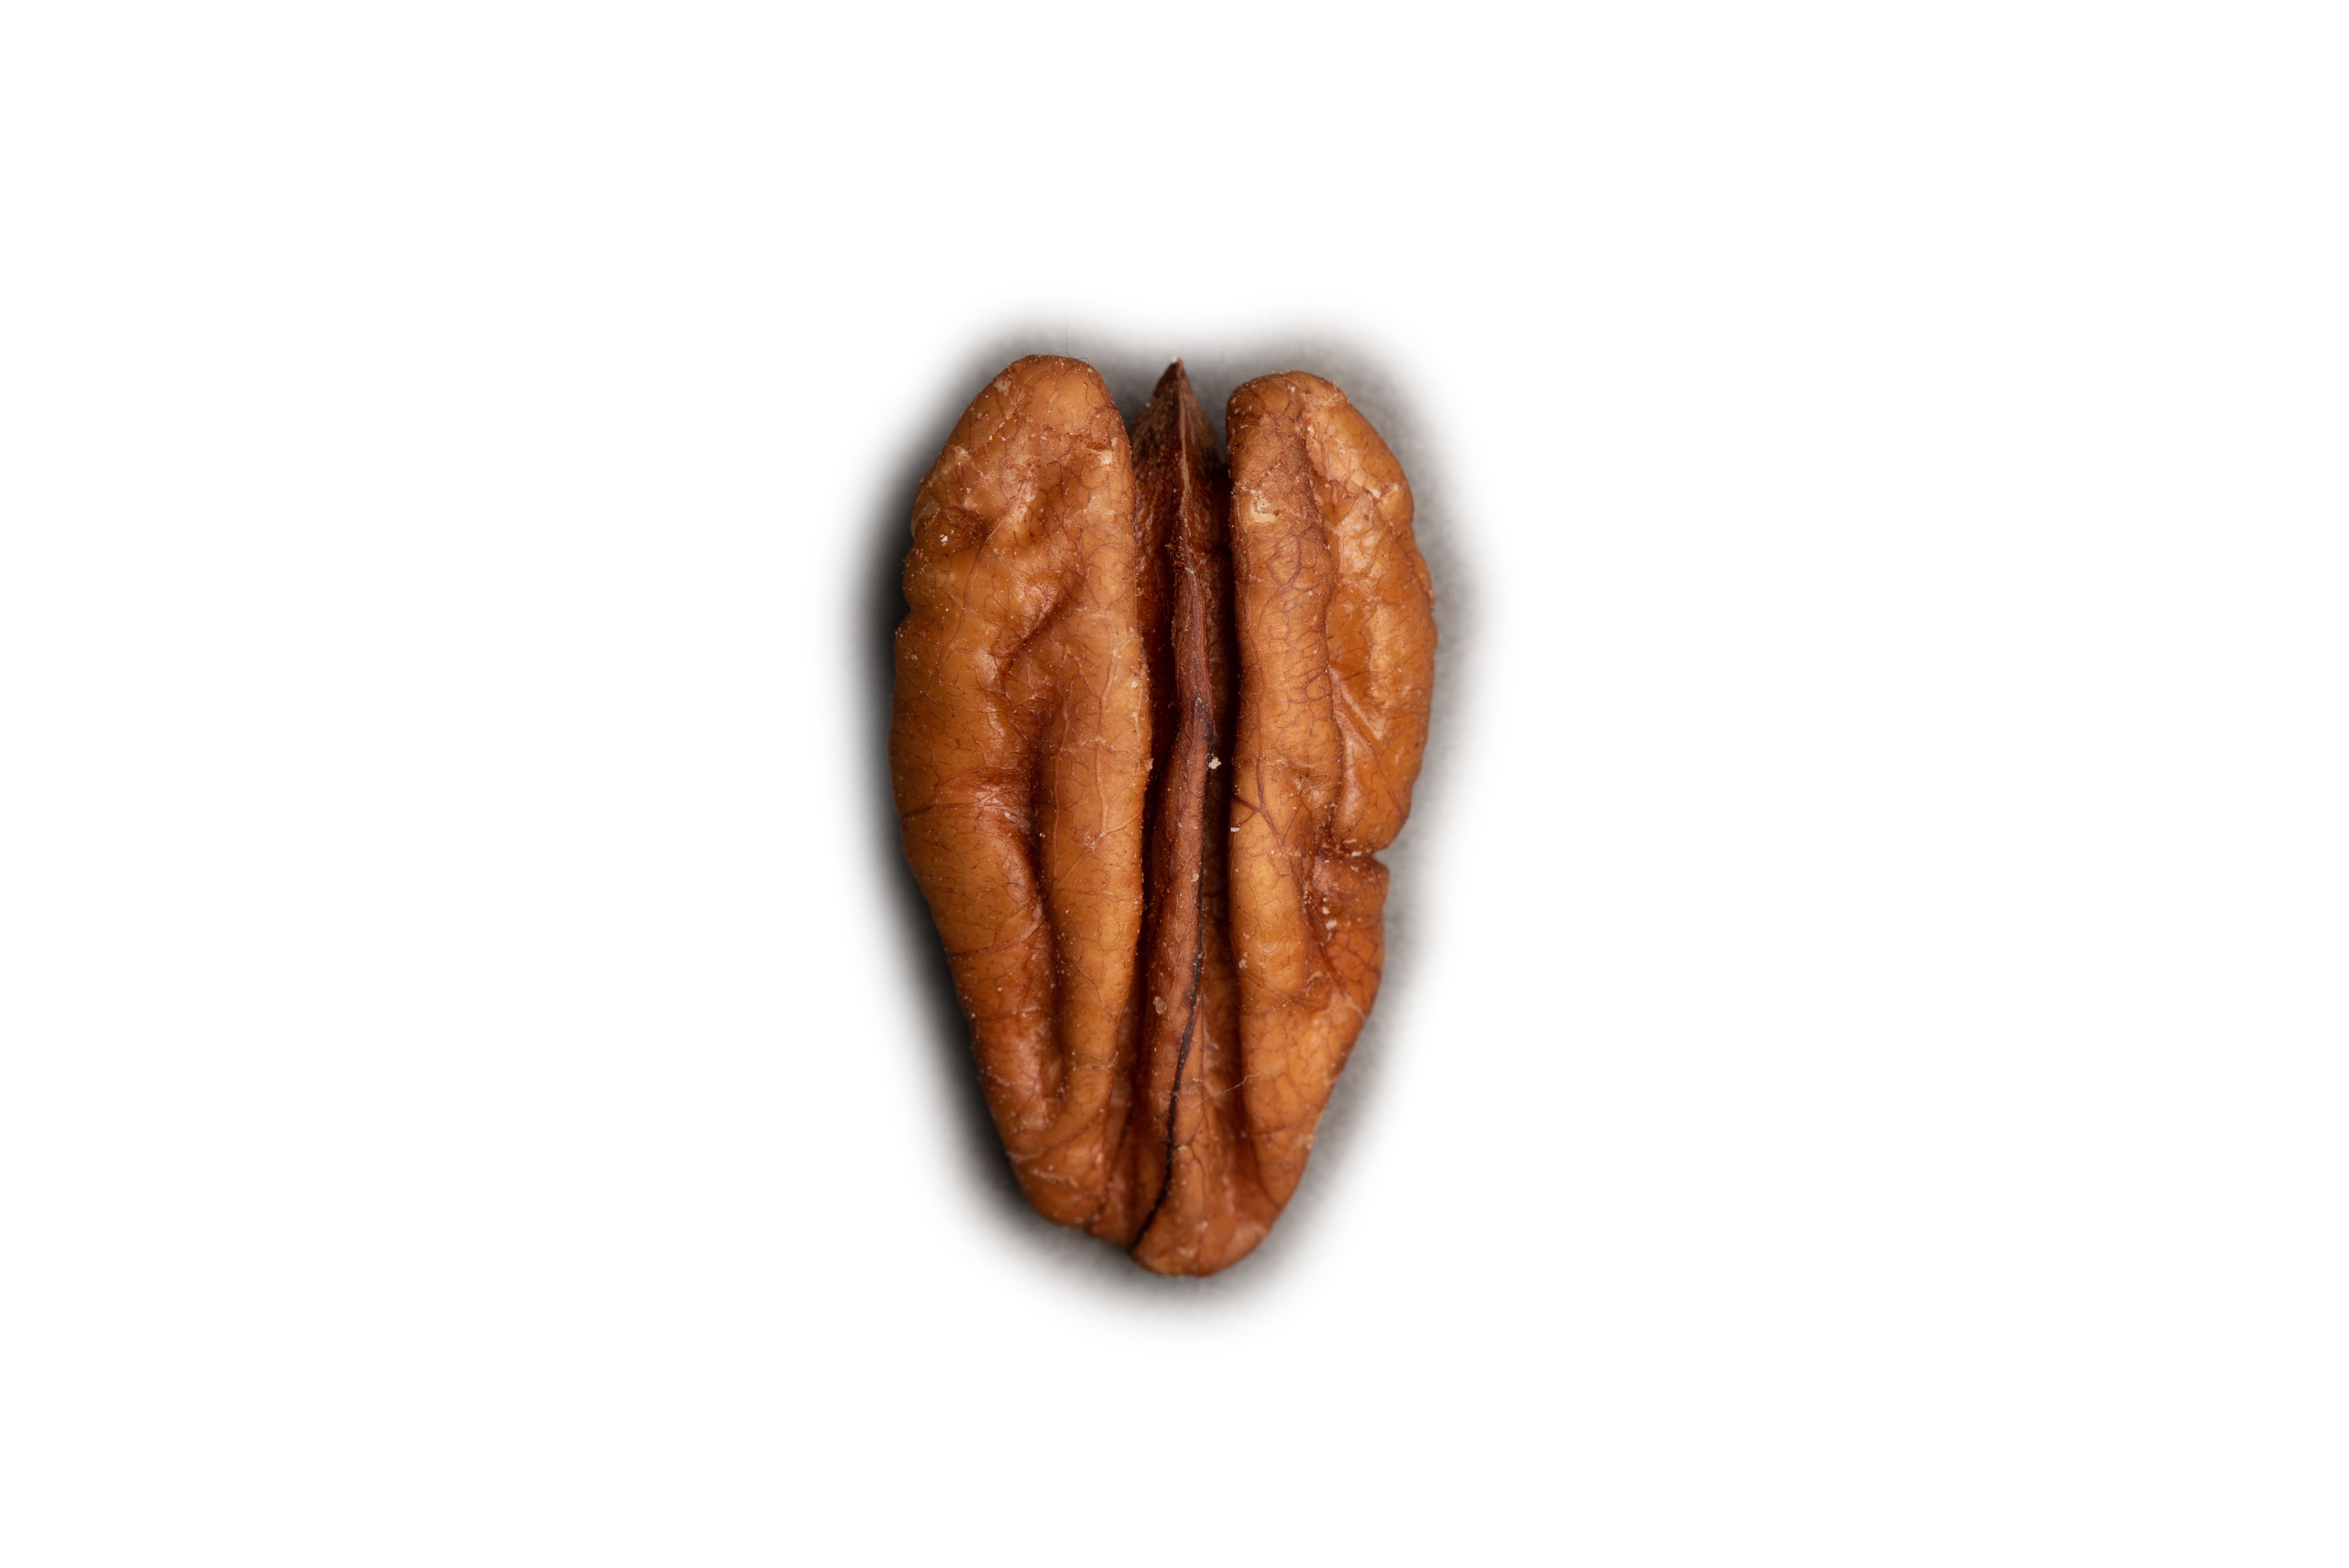 Nut-4